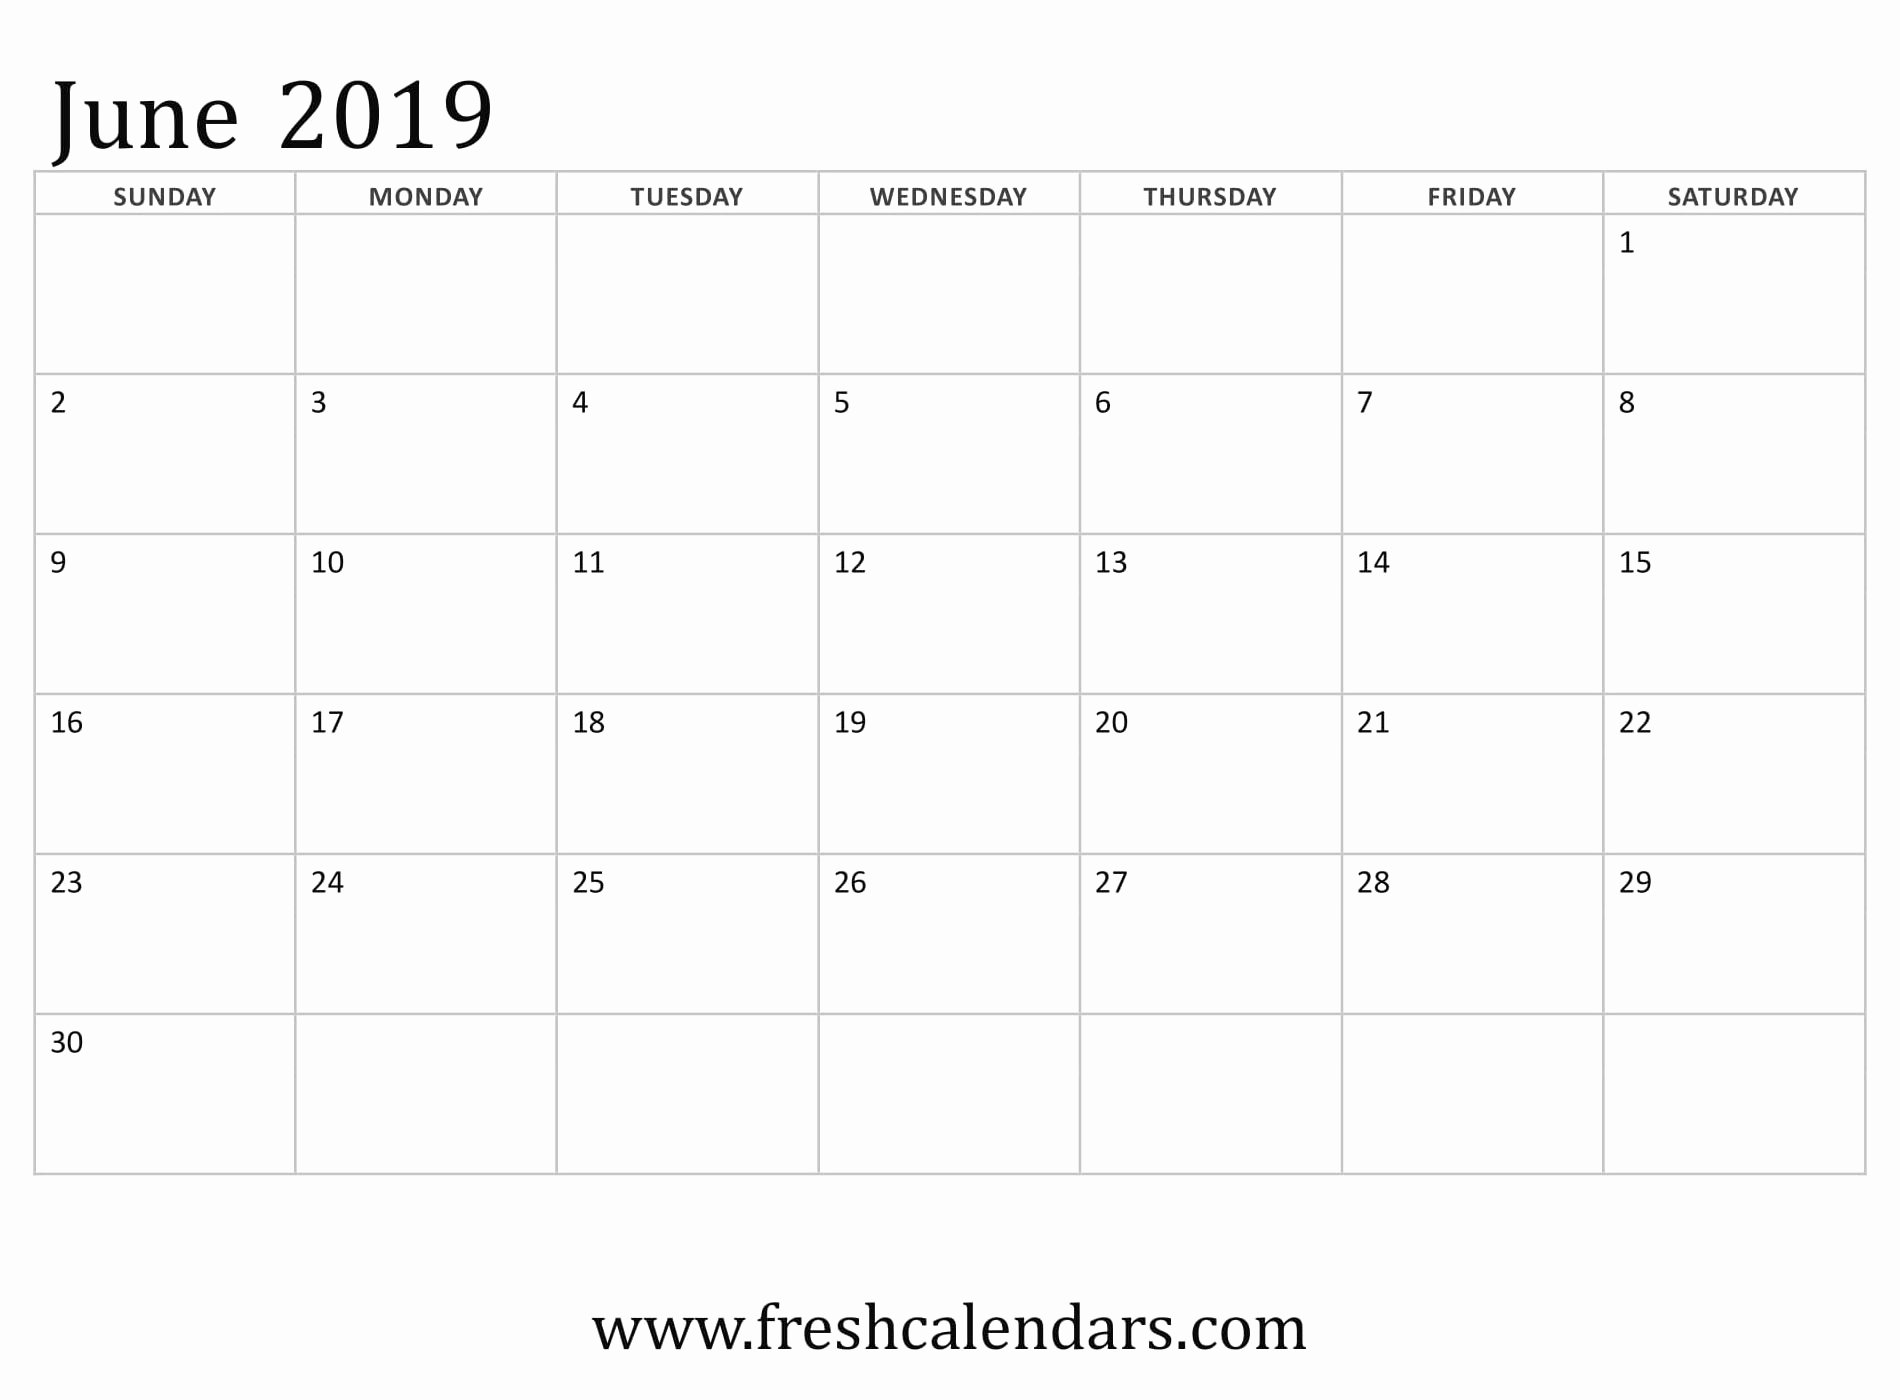 Microsoft Calendar Templates 2019 Awesome June 2019 Calendar Printable Fresh Calendars